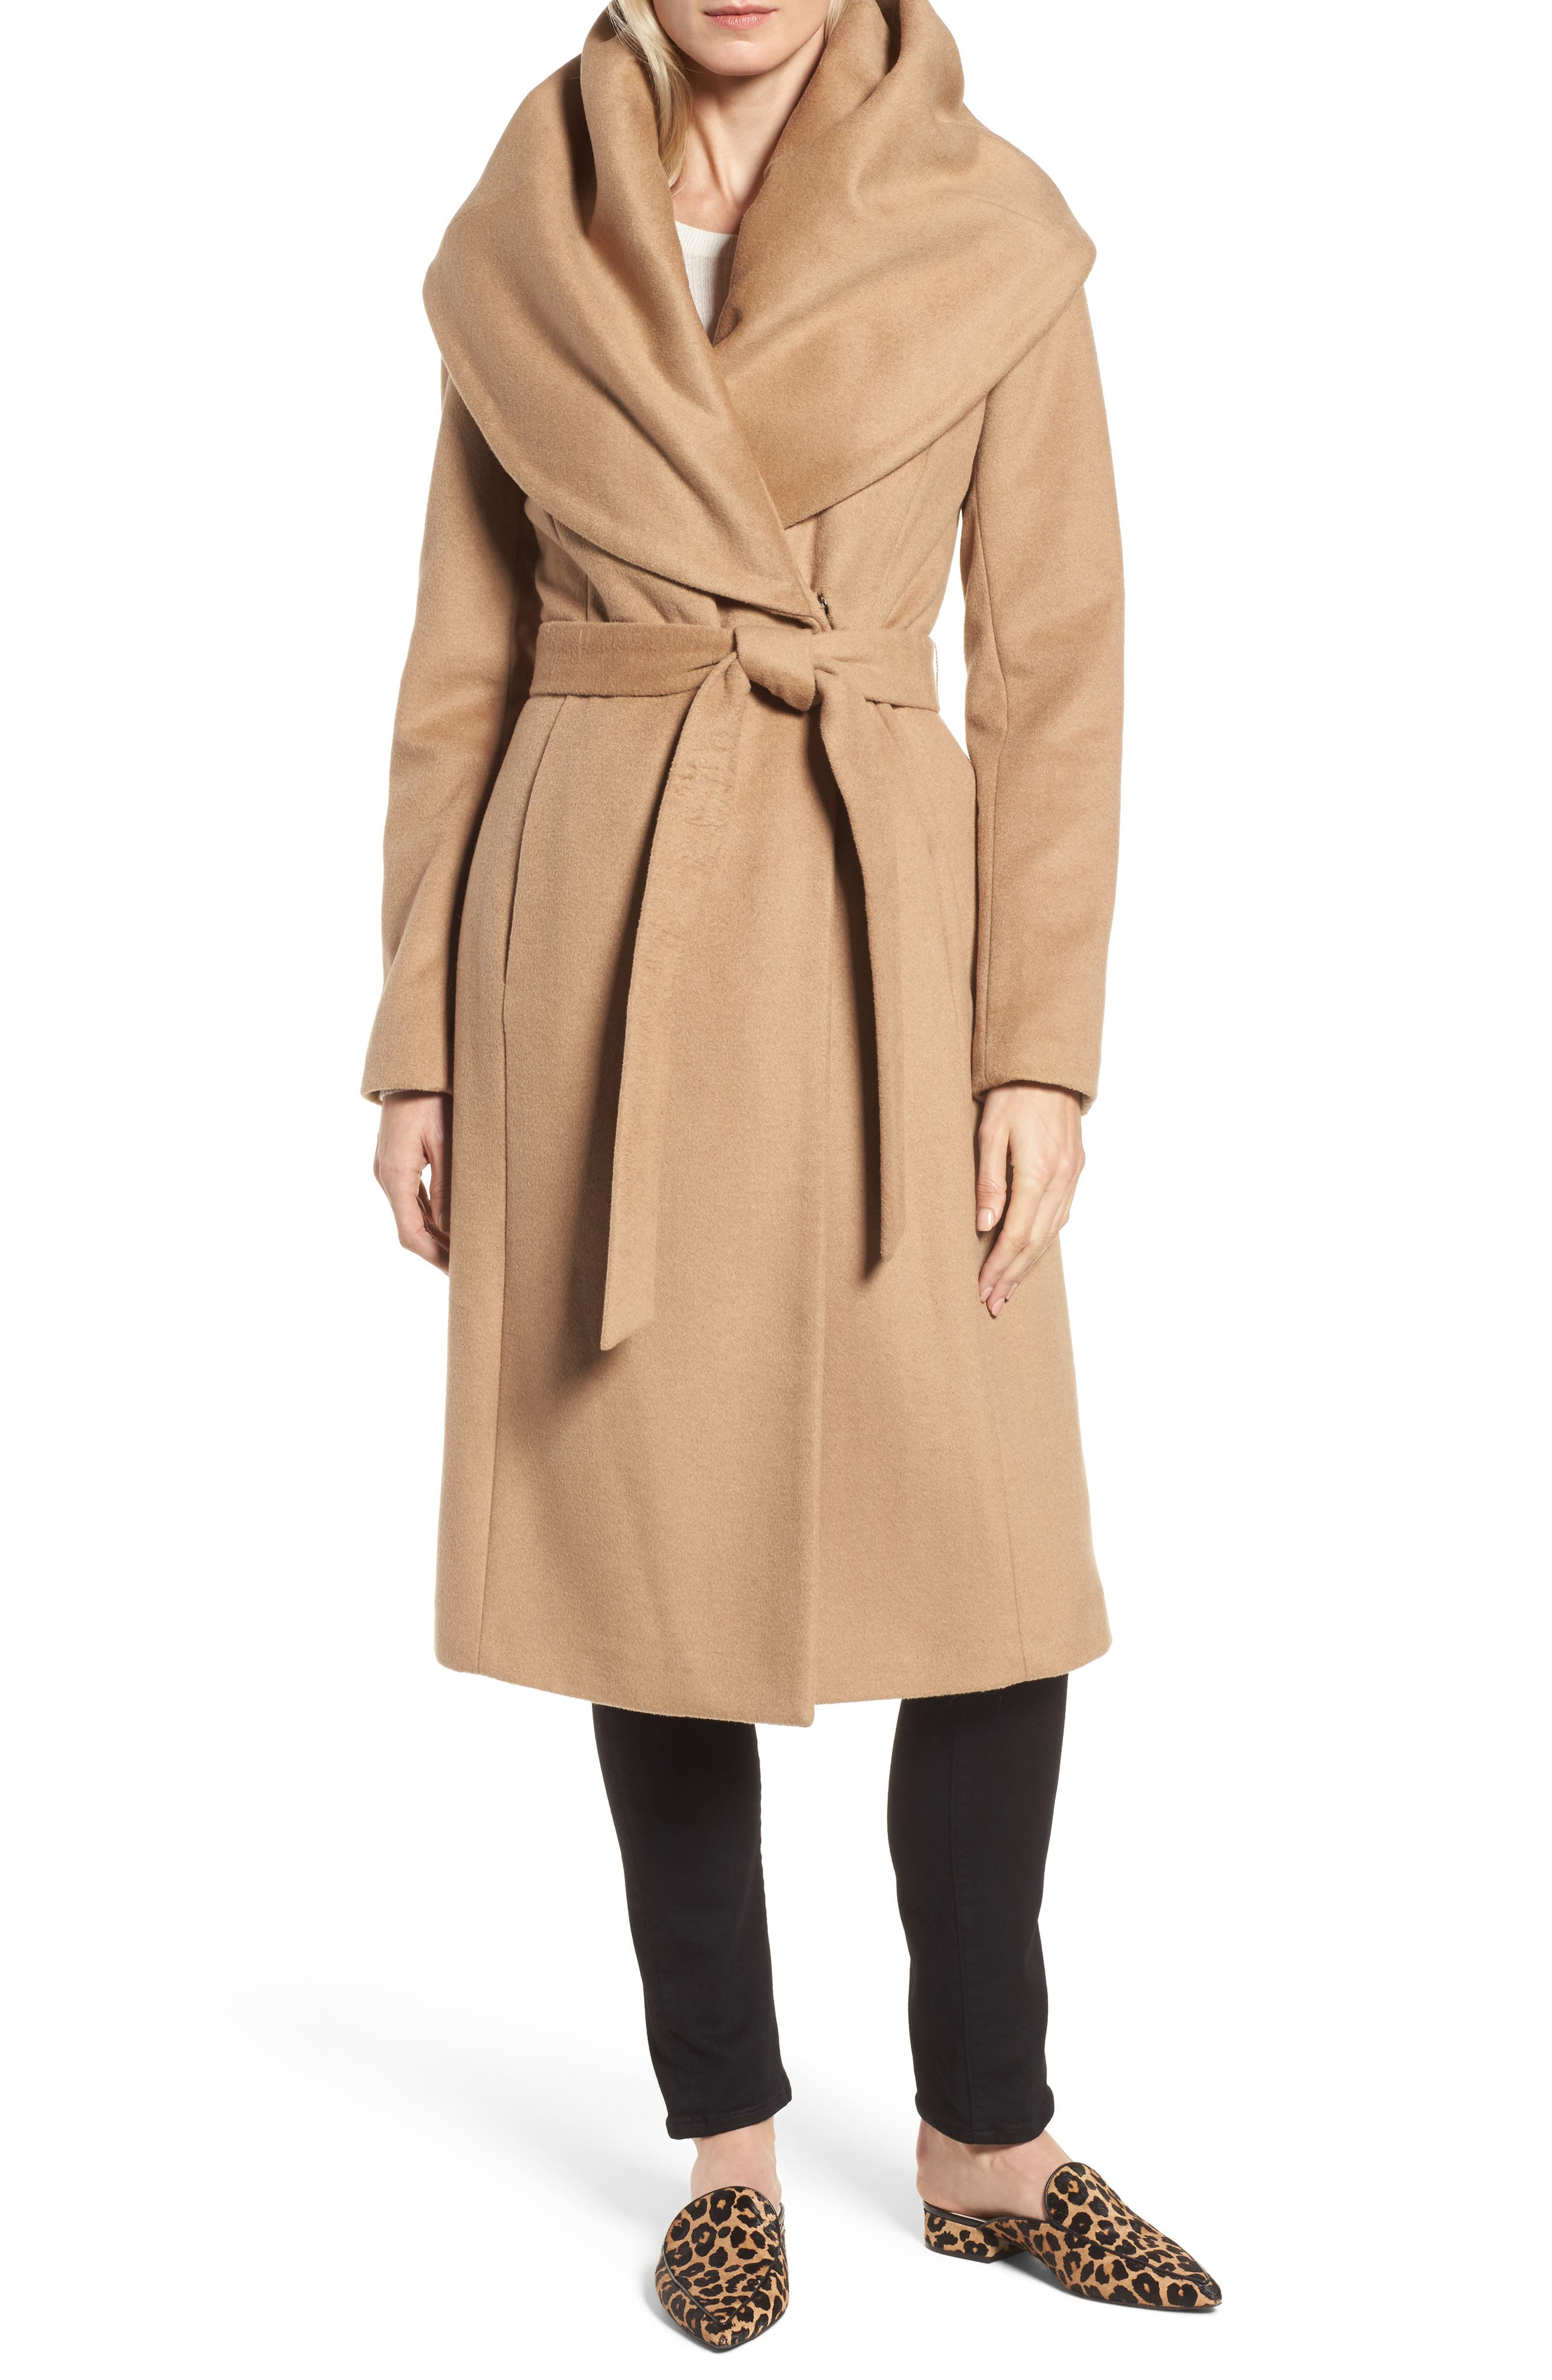 DKNY Wool Blend Shawl Collar Wrap Coat,                             Main thumbnail 1, color,                             252